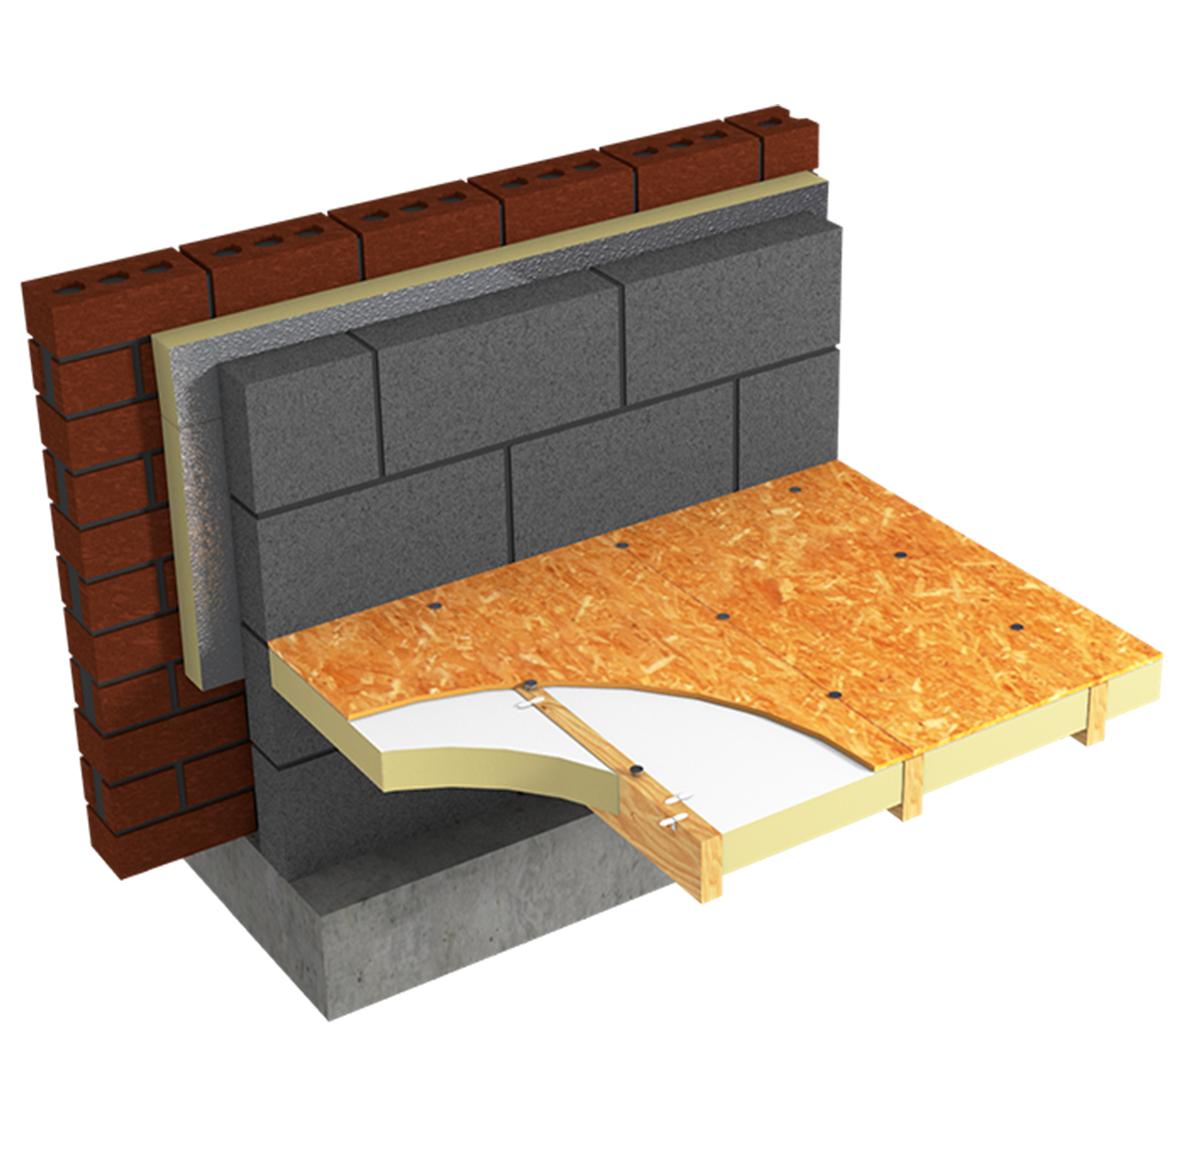 Suspended Floor Insulation Insulation Express